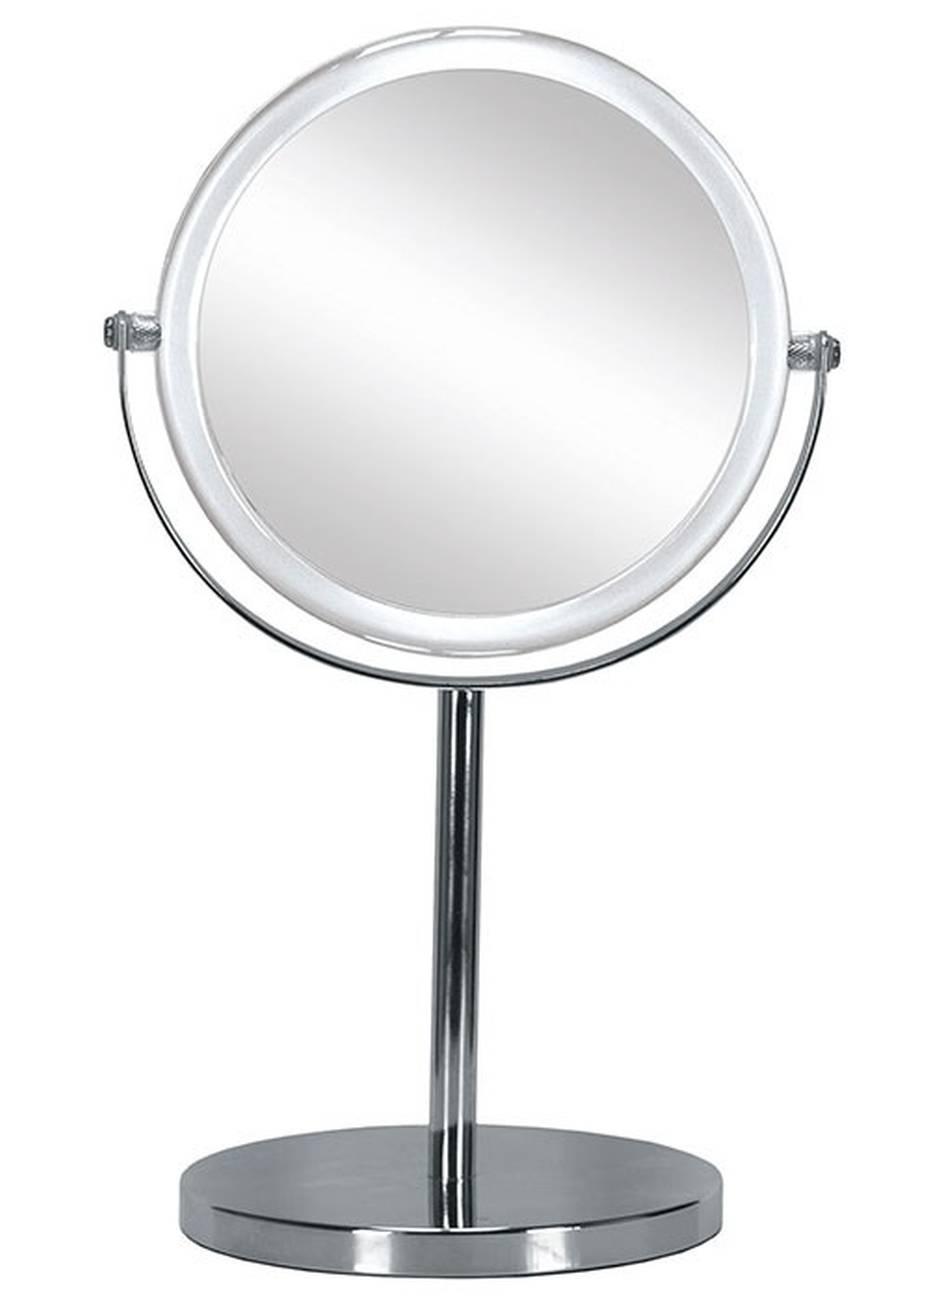 Kosmetikspiegel Transparent Mirror Acryl/Glas/Metall chromiert Clear Spiegel